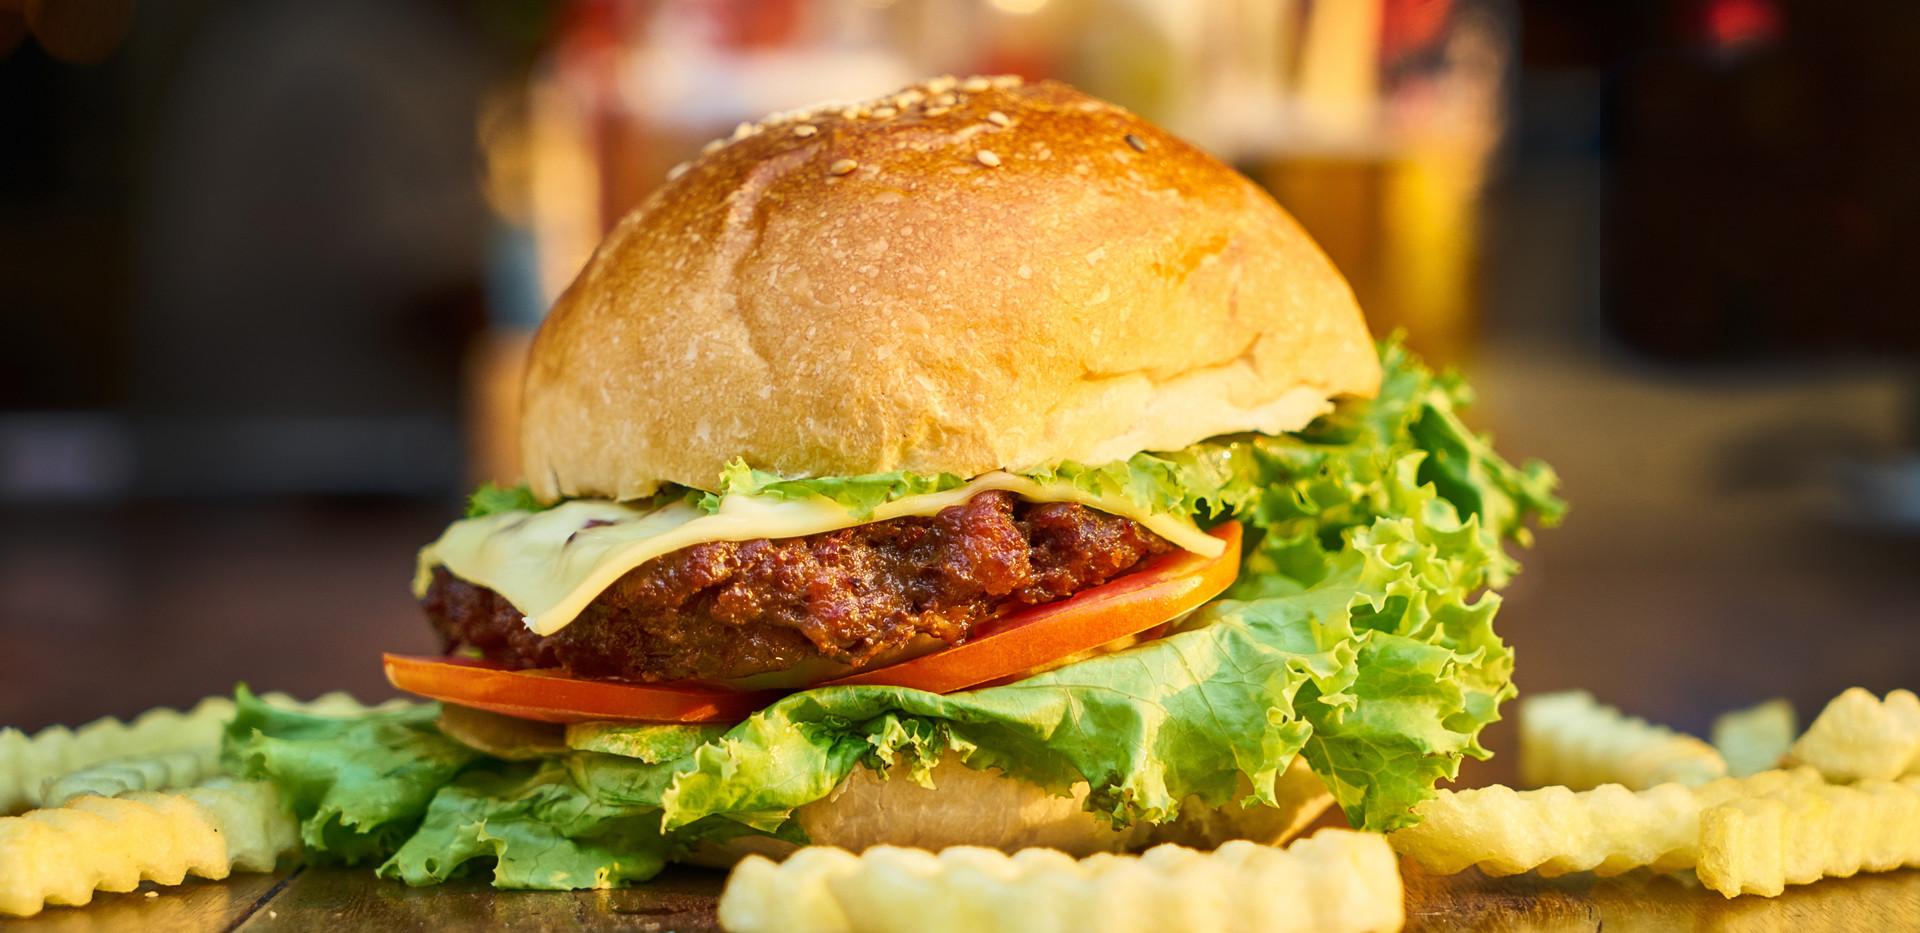 blur-burger-close-up-460599.jpg